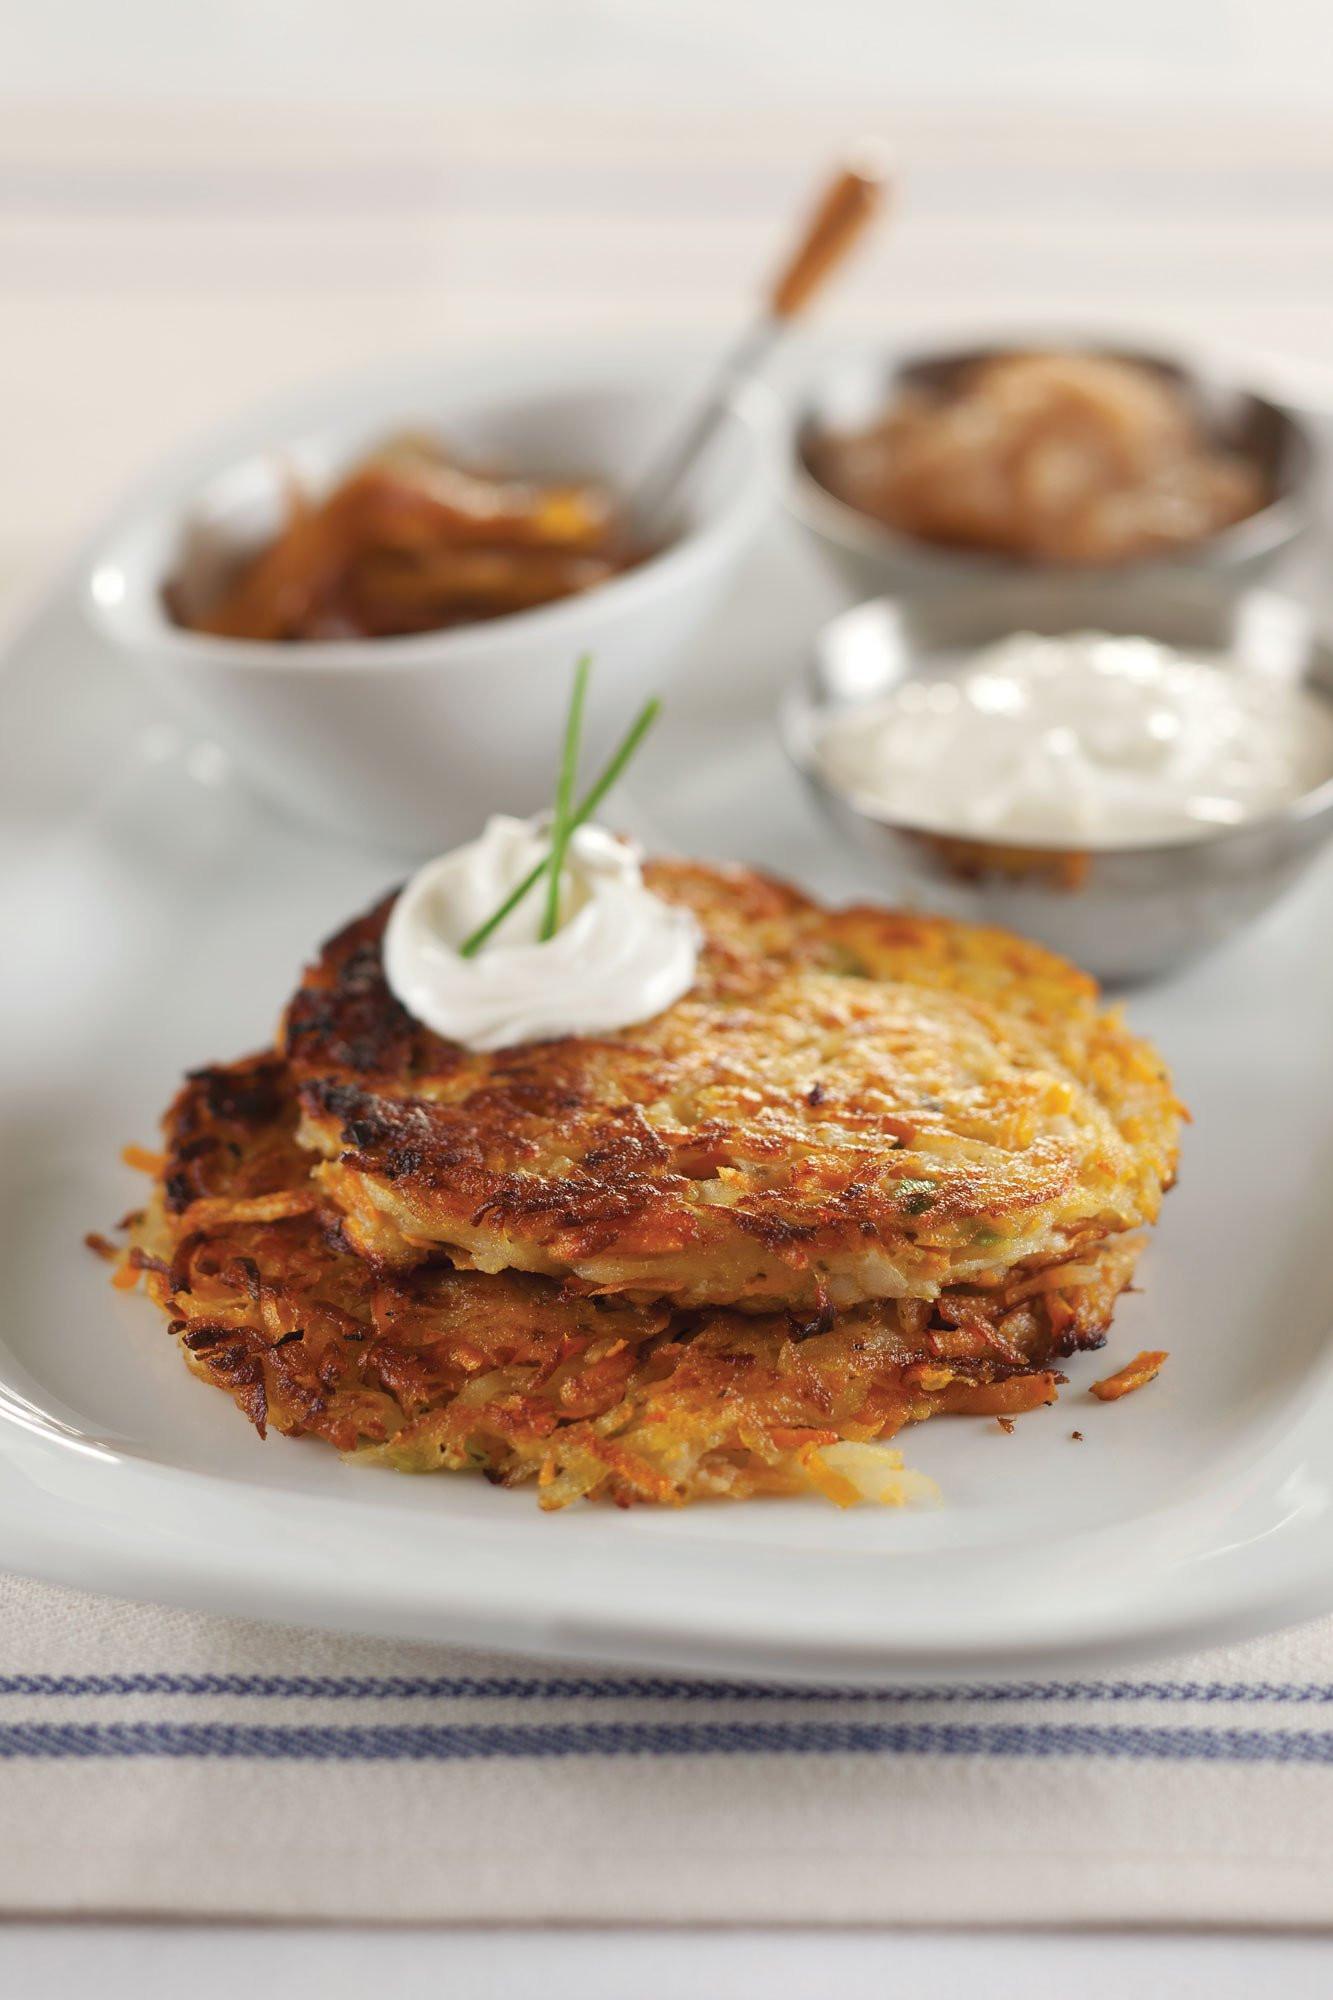 Hanukkah Potato Latkes  A Vegan Sweet Potato Latke Recipe for Hanukkah Vogue